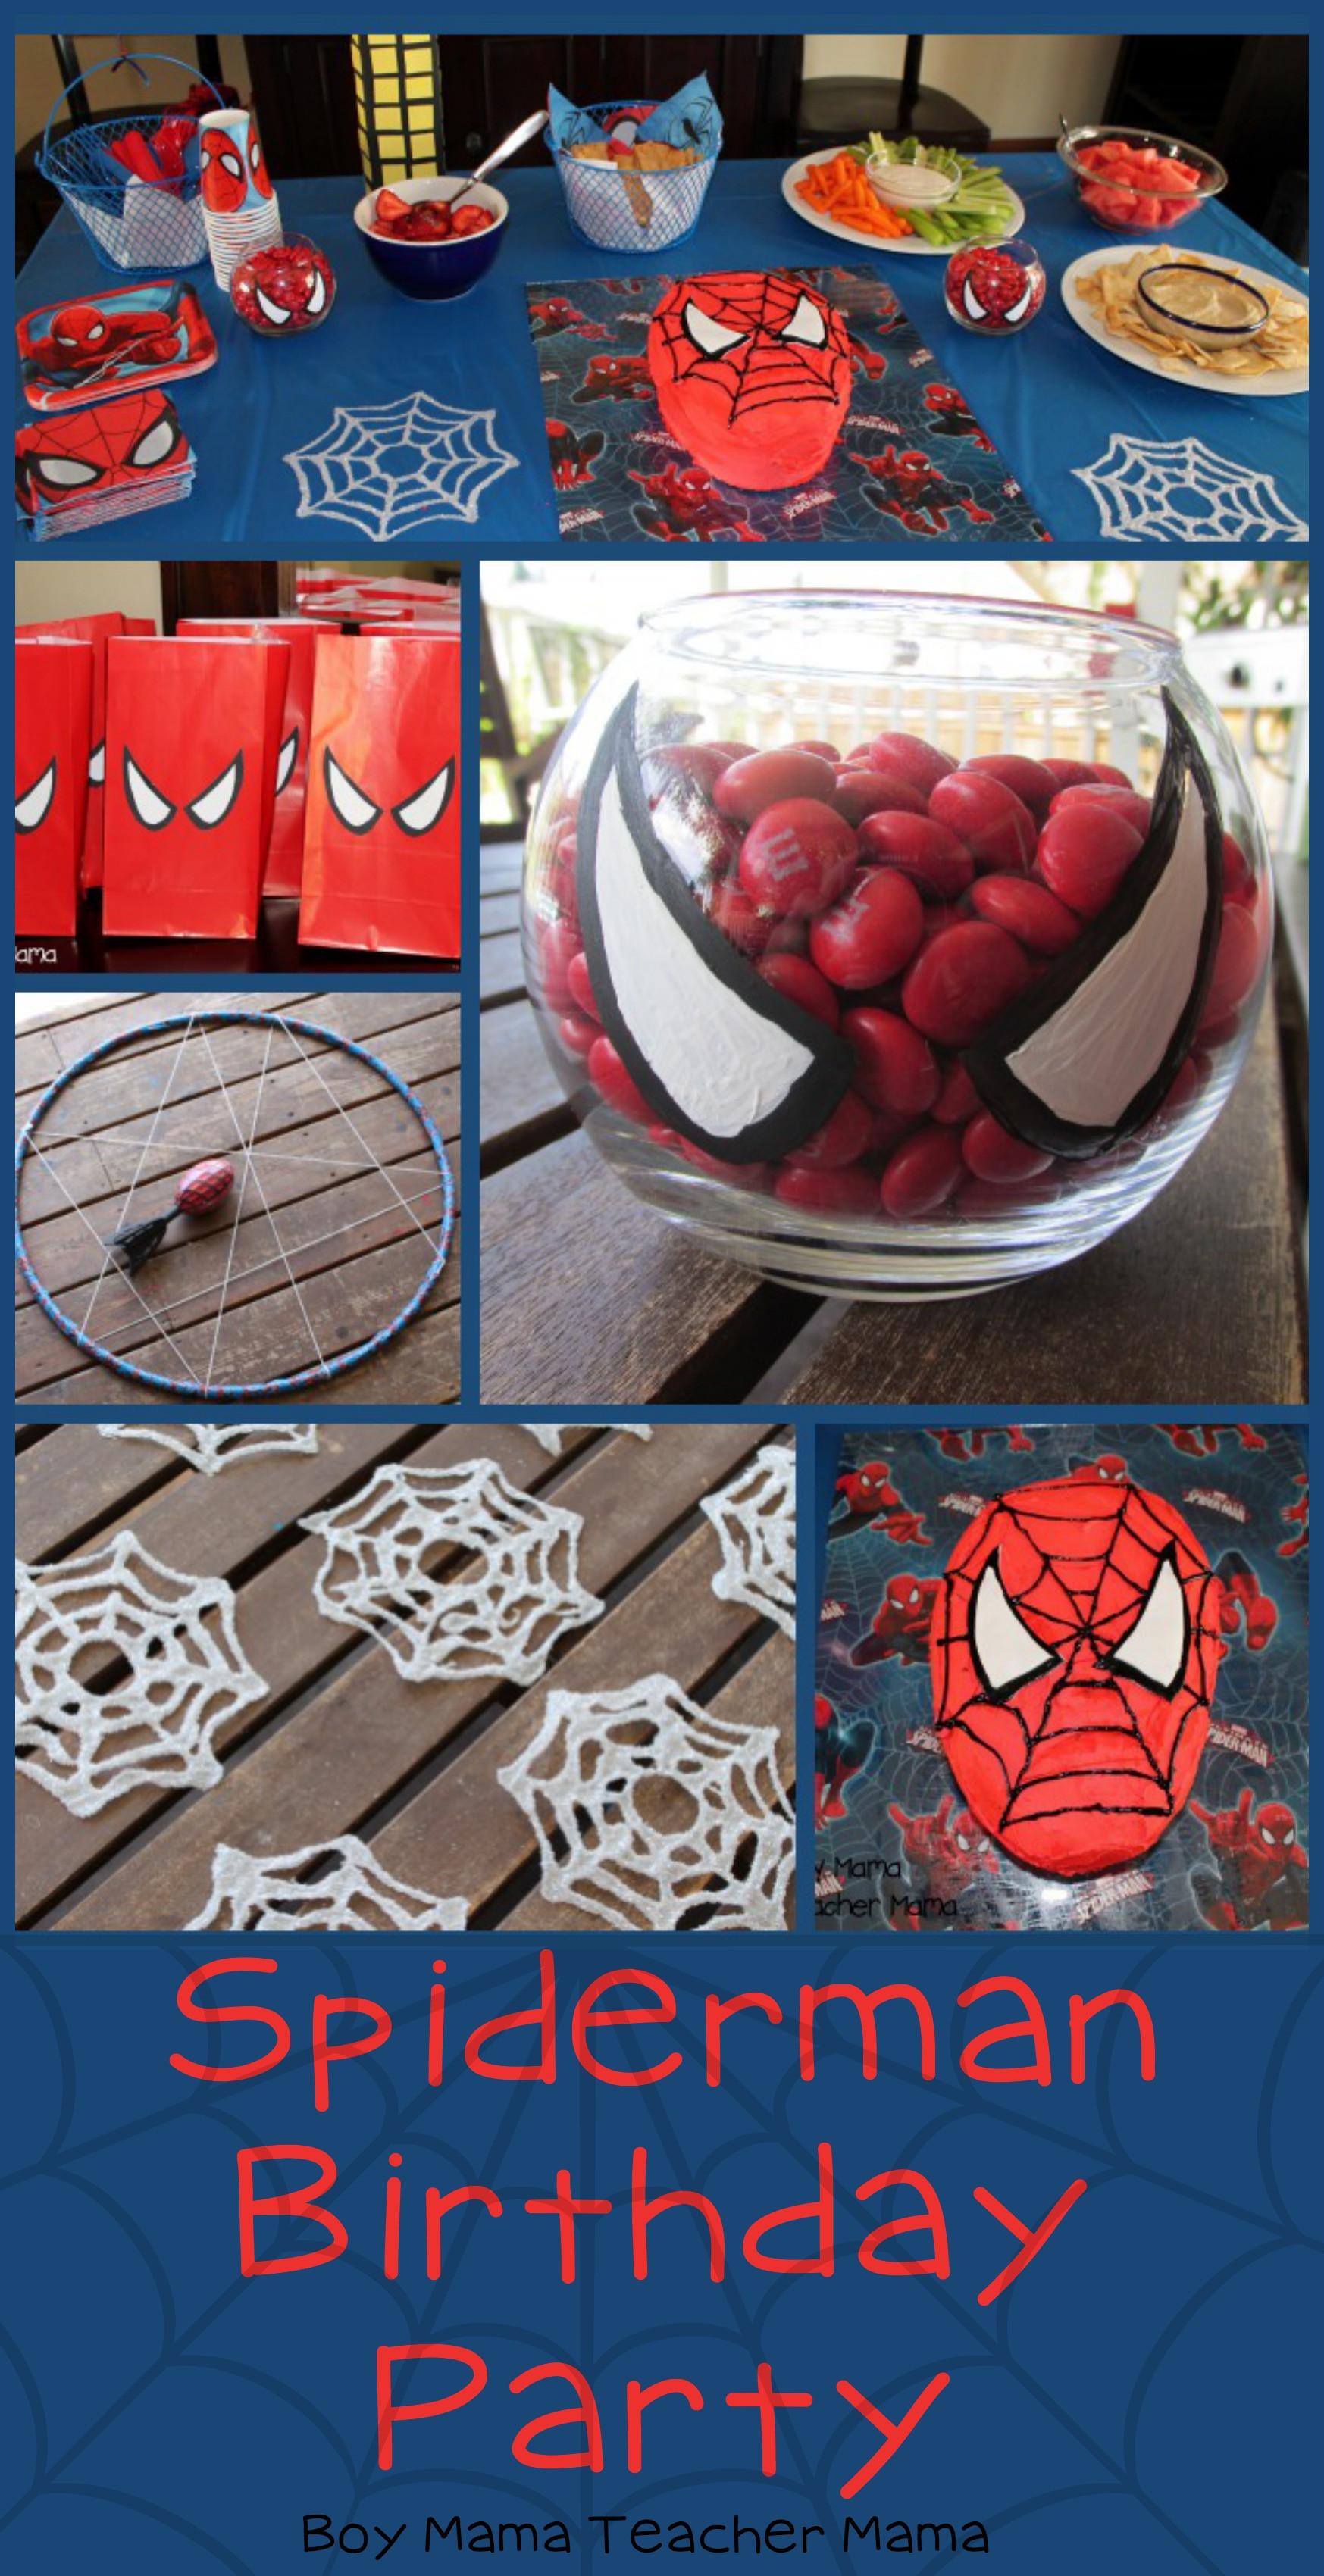 Spiderman Birthday Party Games  Boy Mama Spiderman Birthday Party Boy Mama Teacher Mama